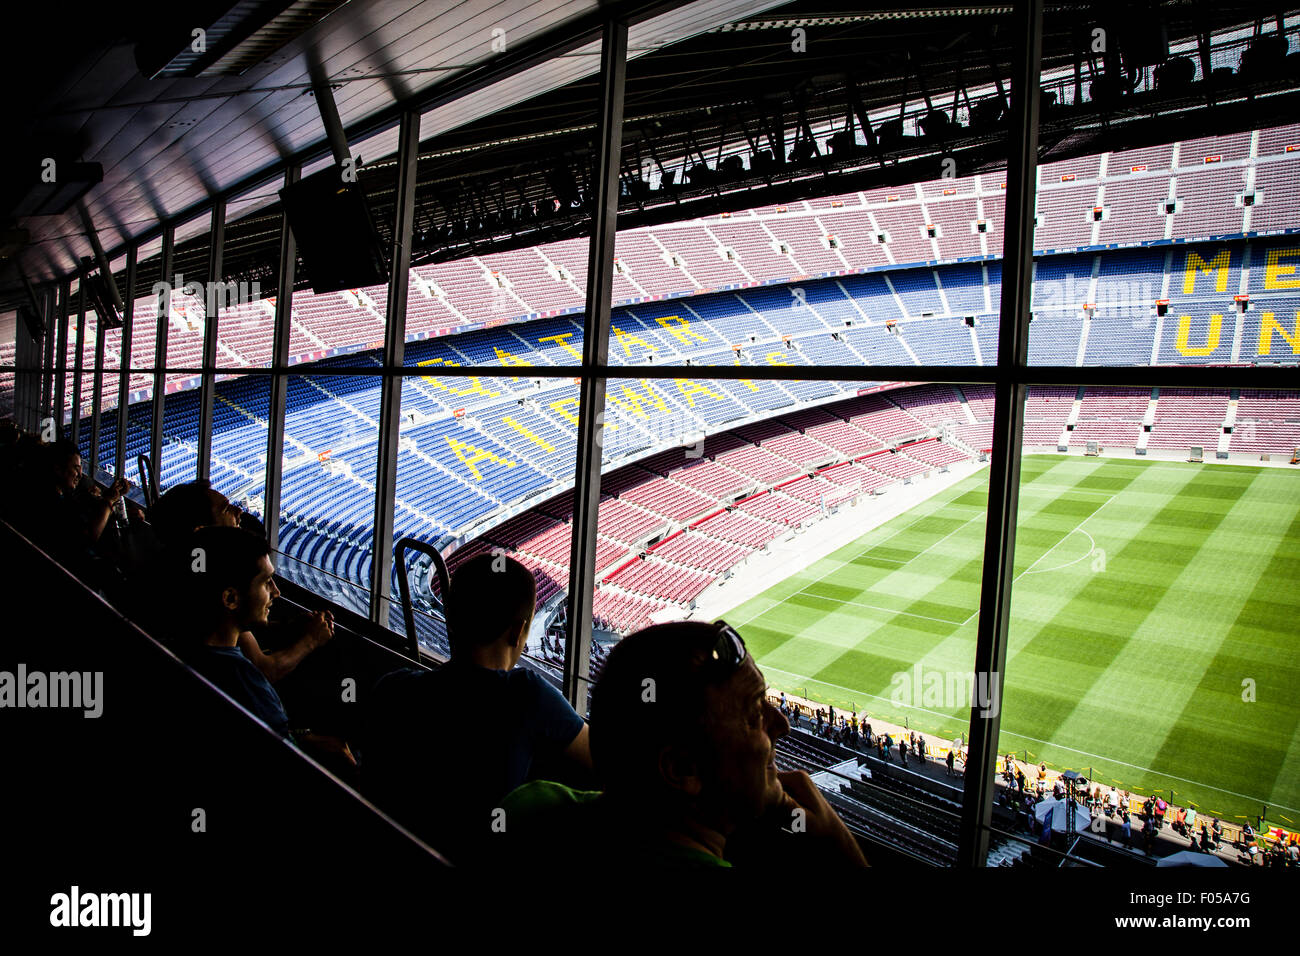 FC Barcelona (Nou Camp) football stadium Stock Photo